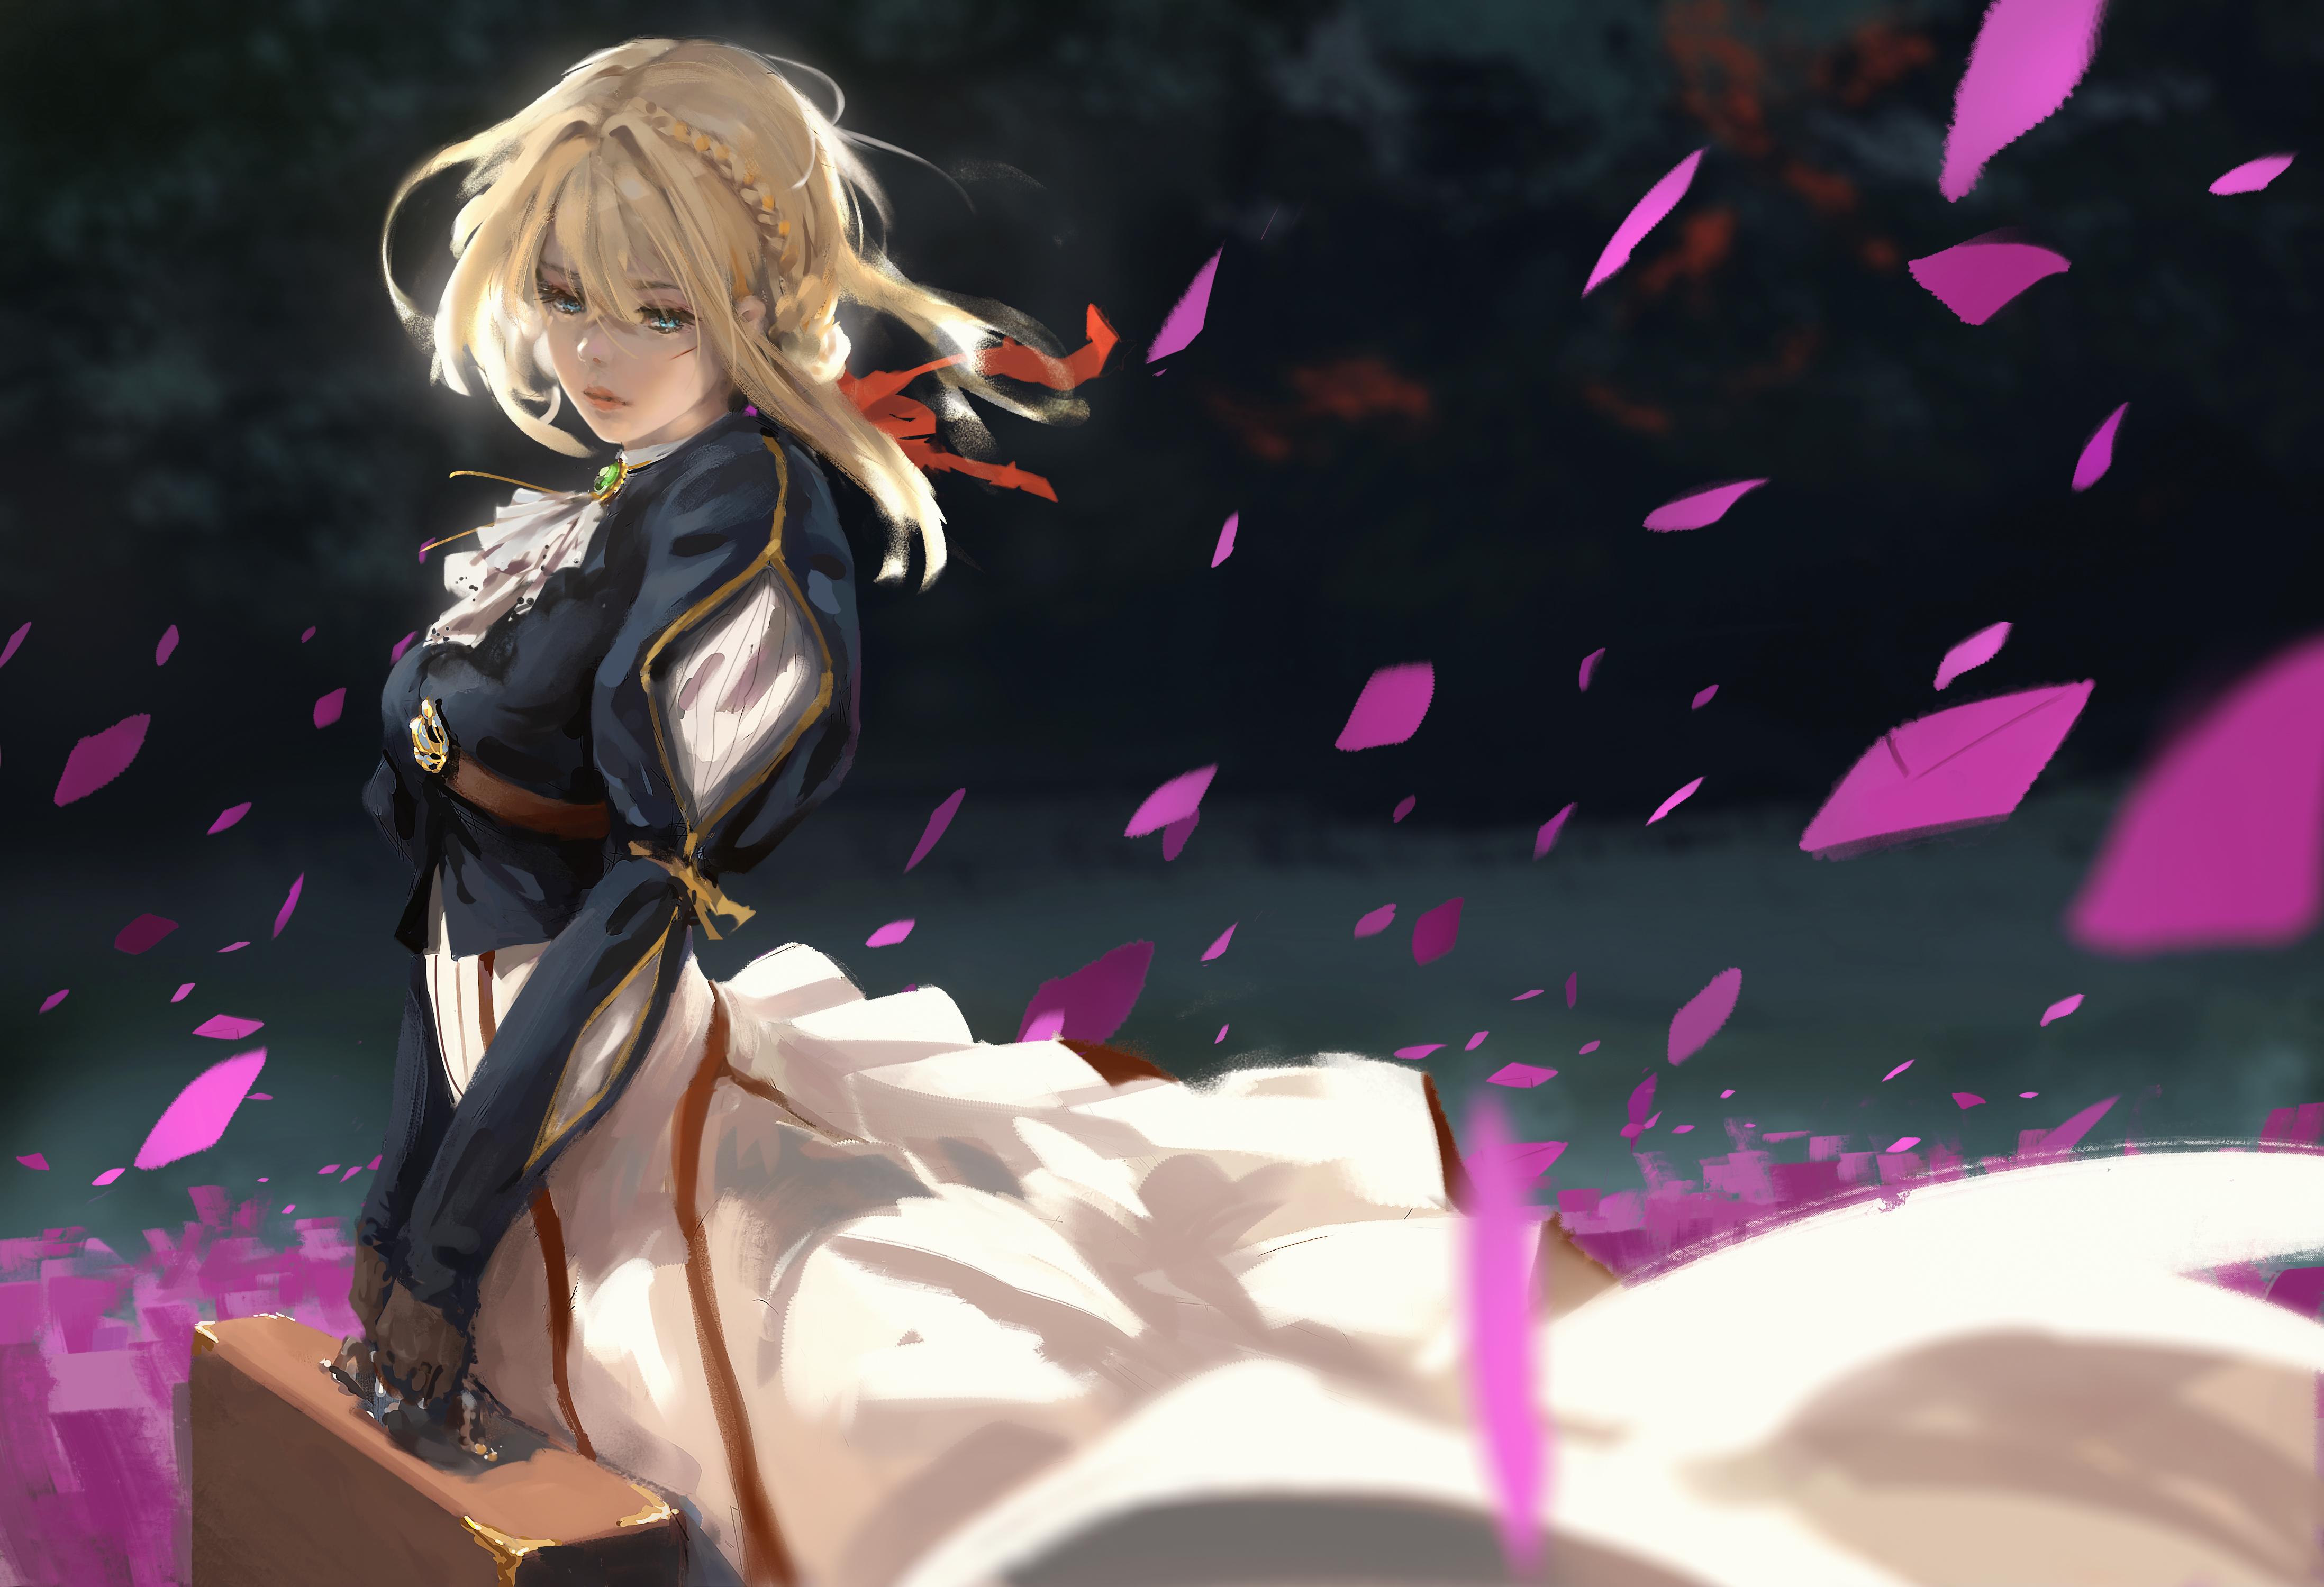 Violet Evergarden Fanart 4k, HD Anime, 4k Wallpapers ...